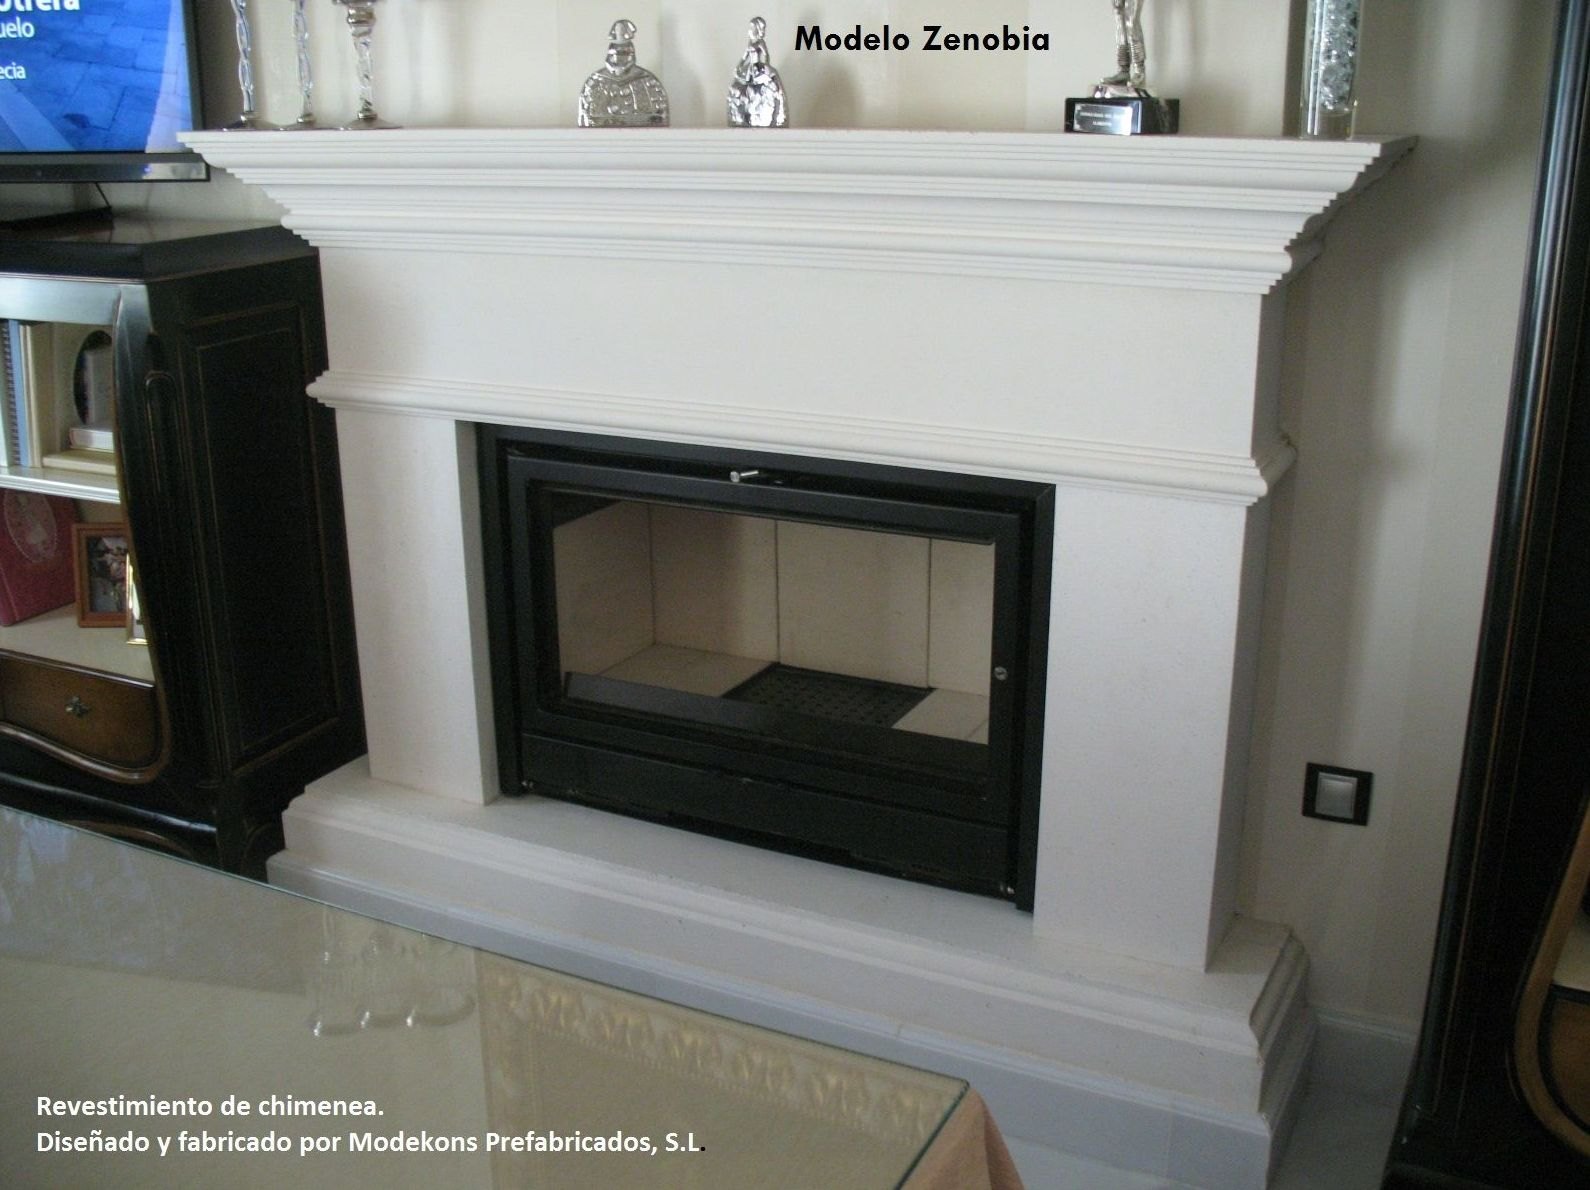 Chimenea modelo Zenobia, fabricada en marmolina blanca